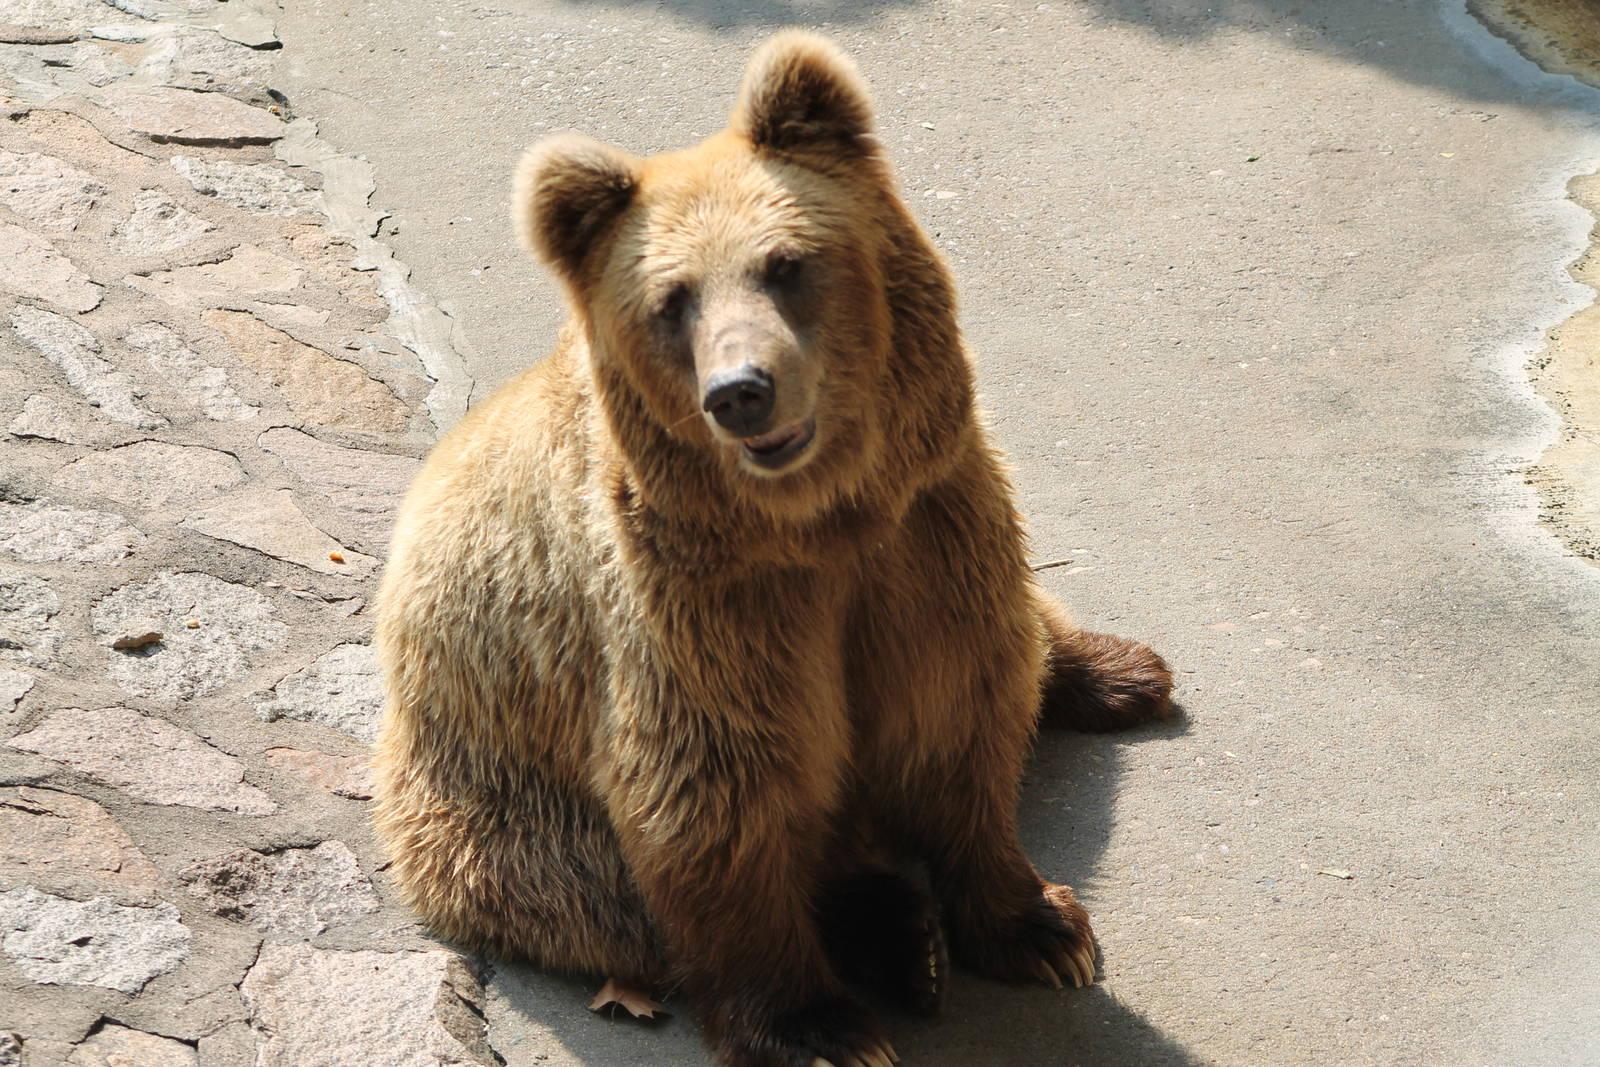 Himalayan bear: photo, description, habitat and lifestyle of the animal 25